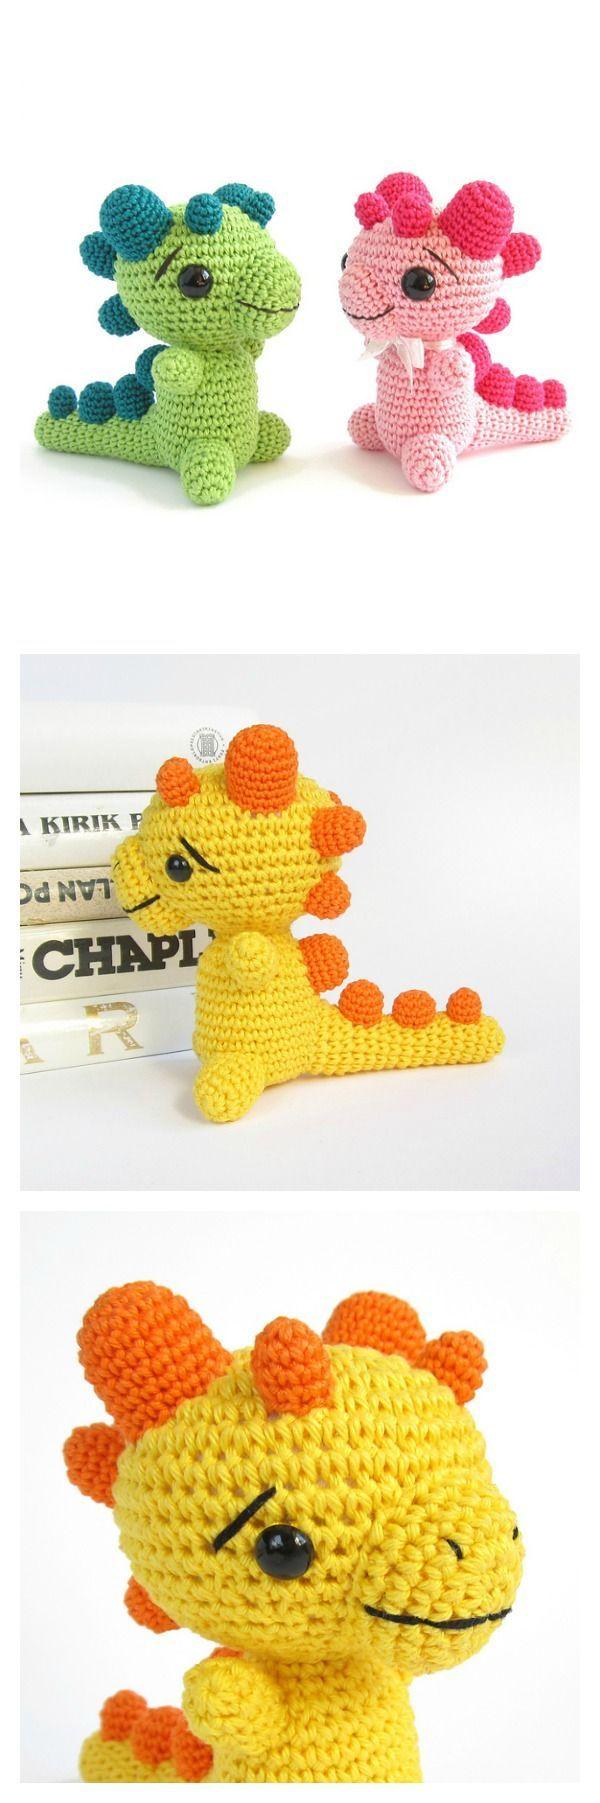 Crochet Amigurumi Dinosaur Free Patterns | Crafty Crochet | Pinterest